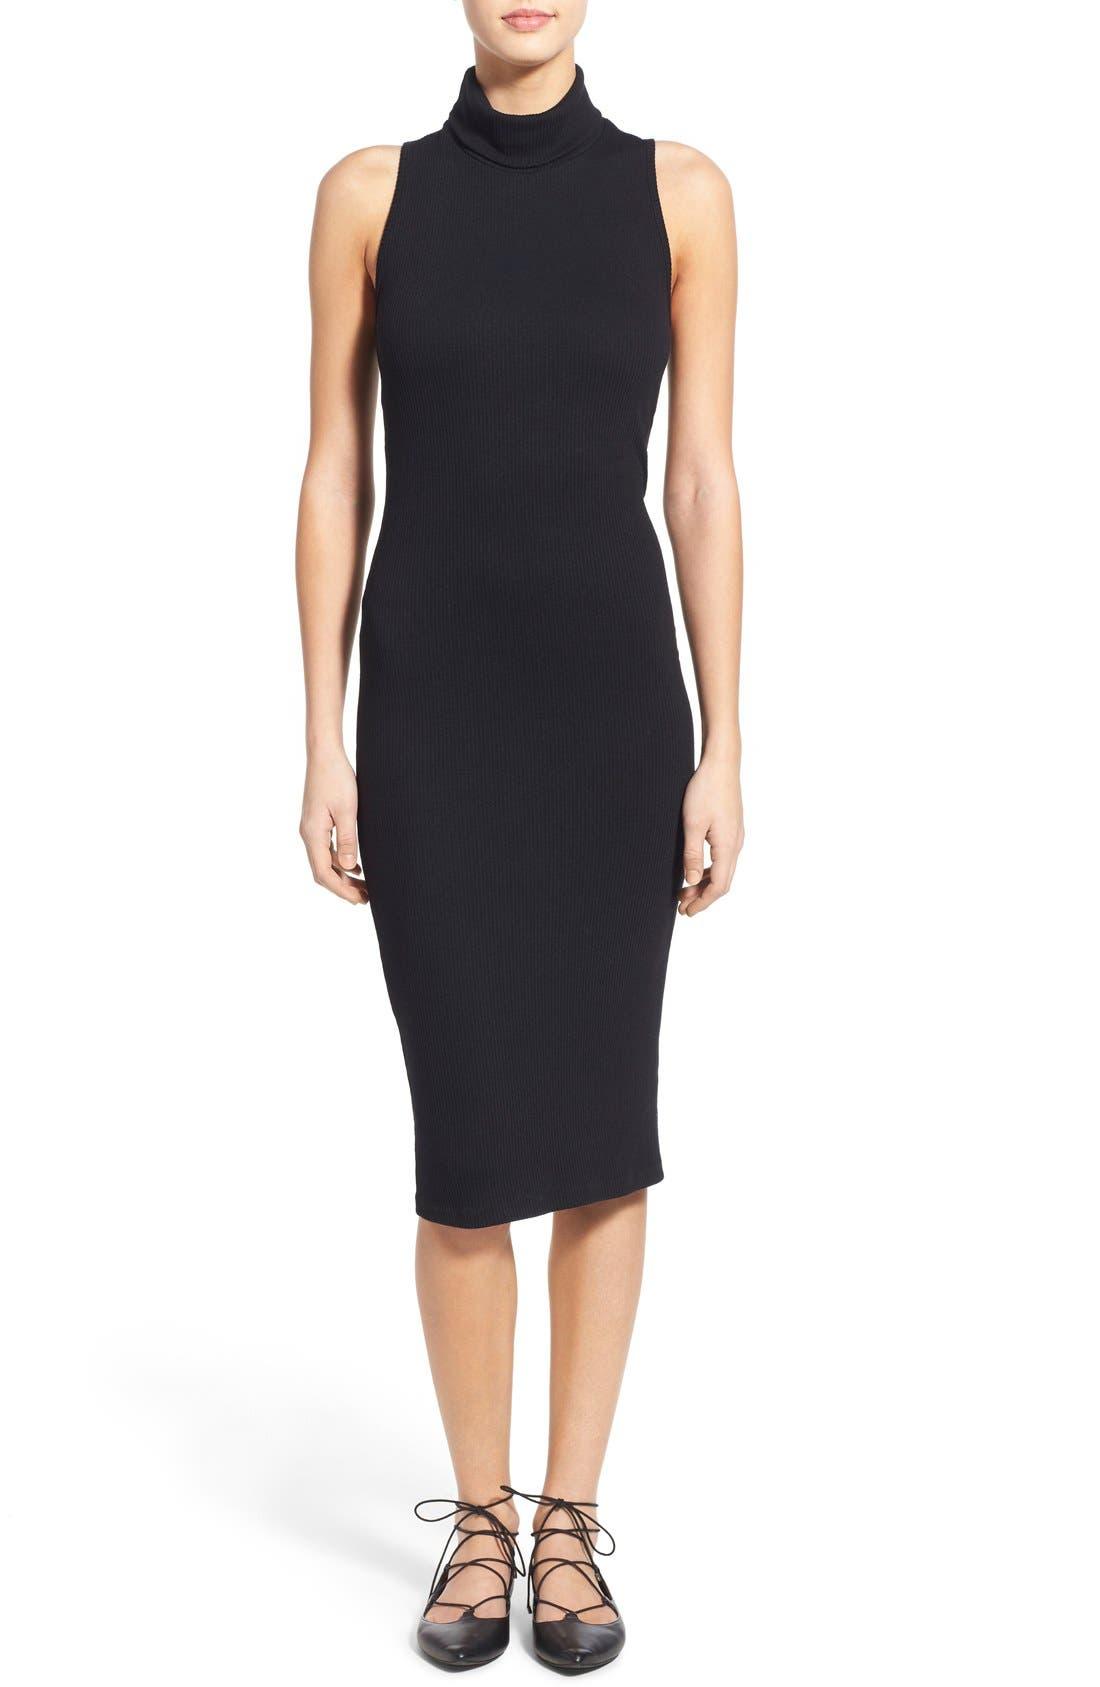 Sleeveless Turtleneck Dresses